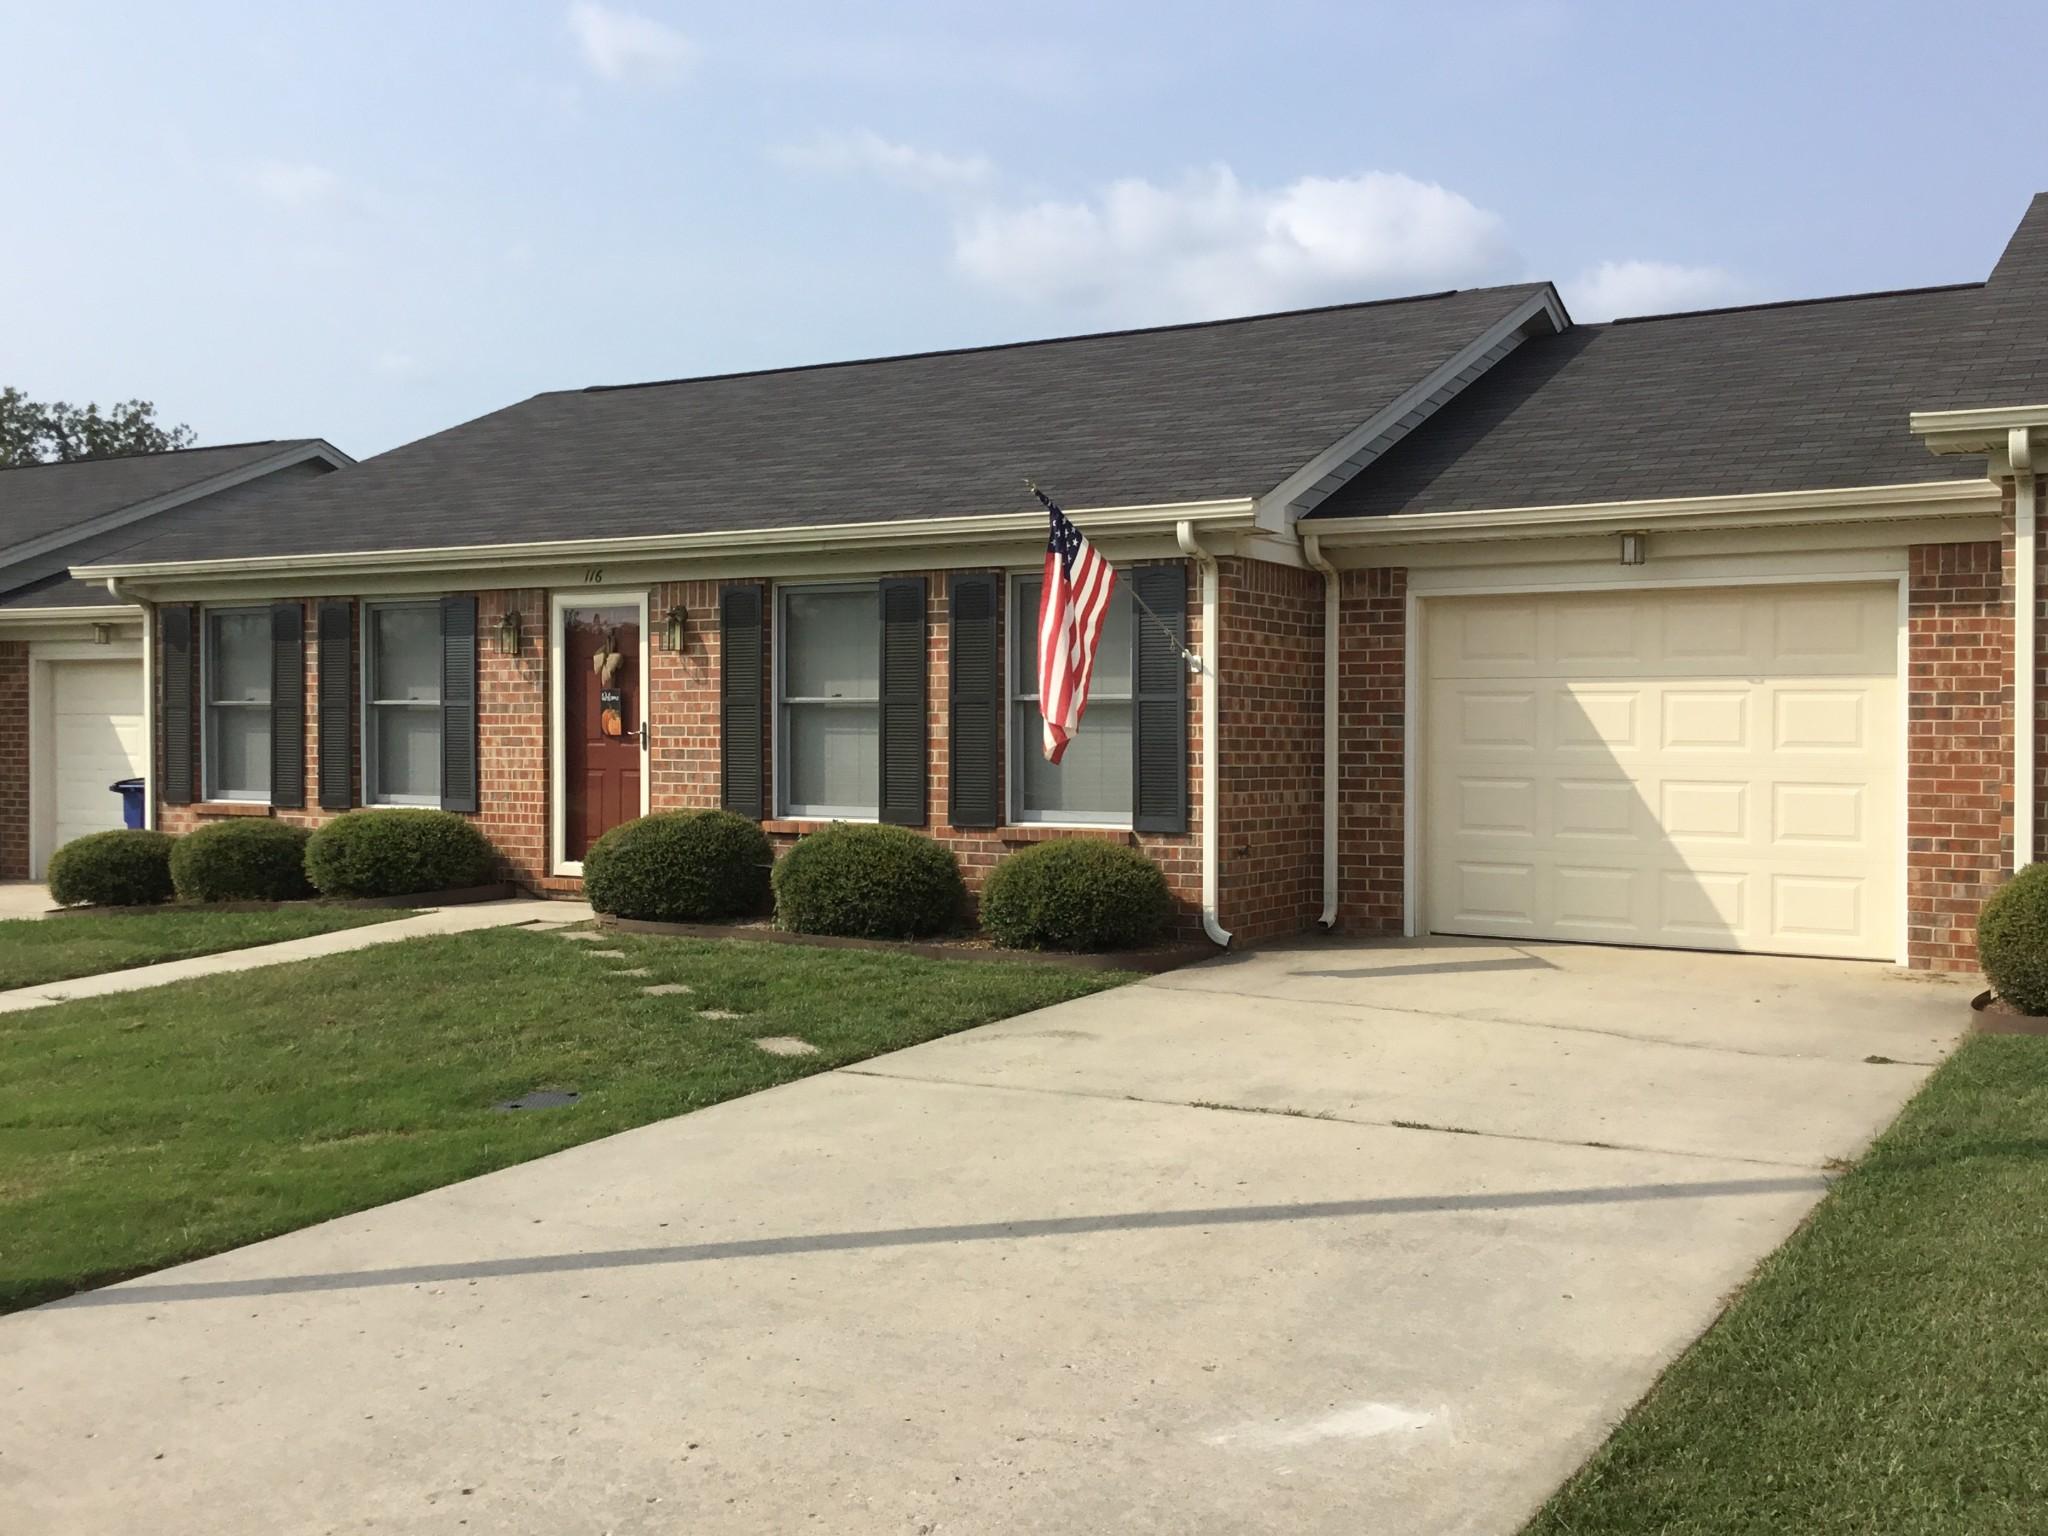 Shelbyville Tn Condos For Sale Apartments Condo Com